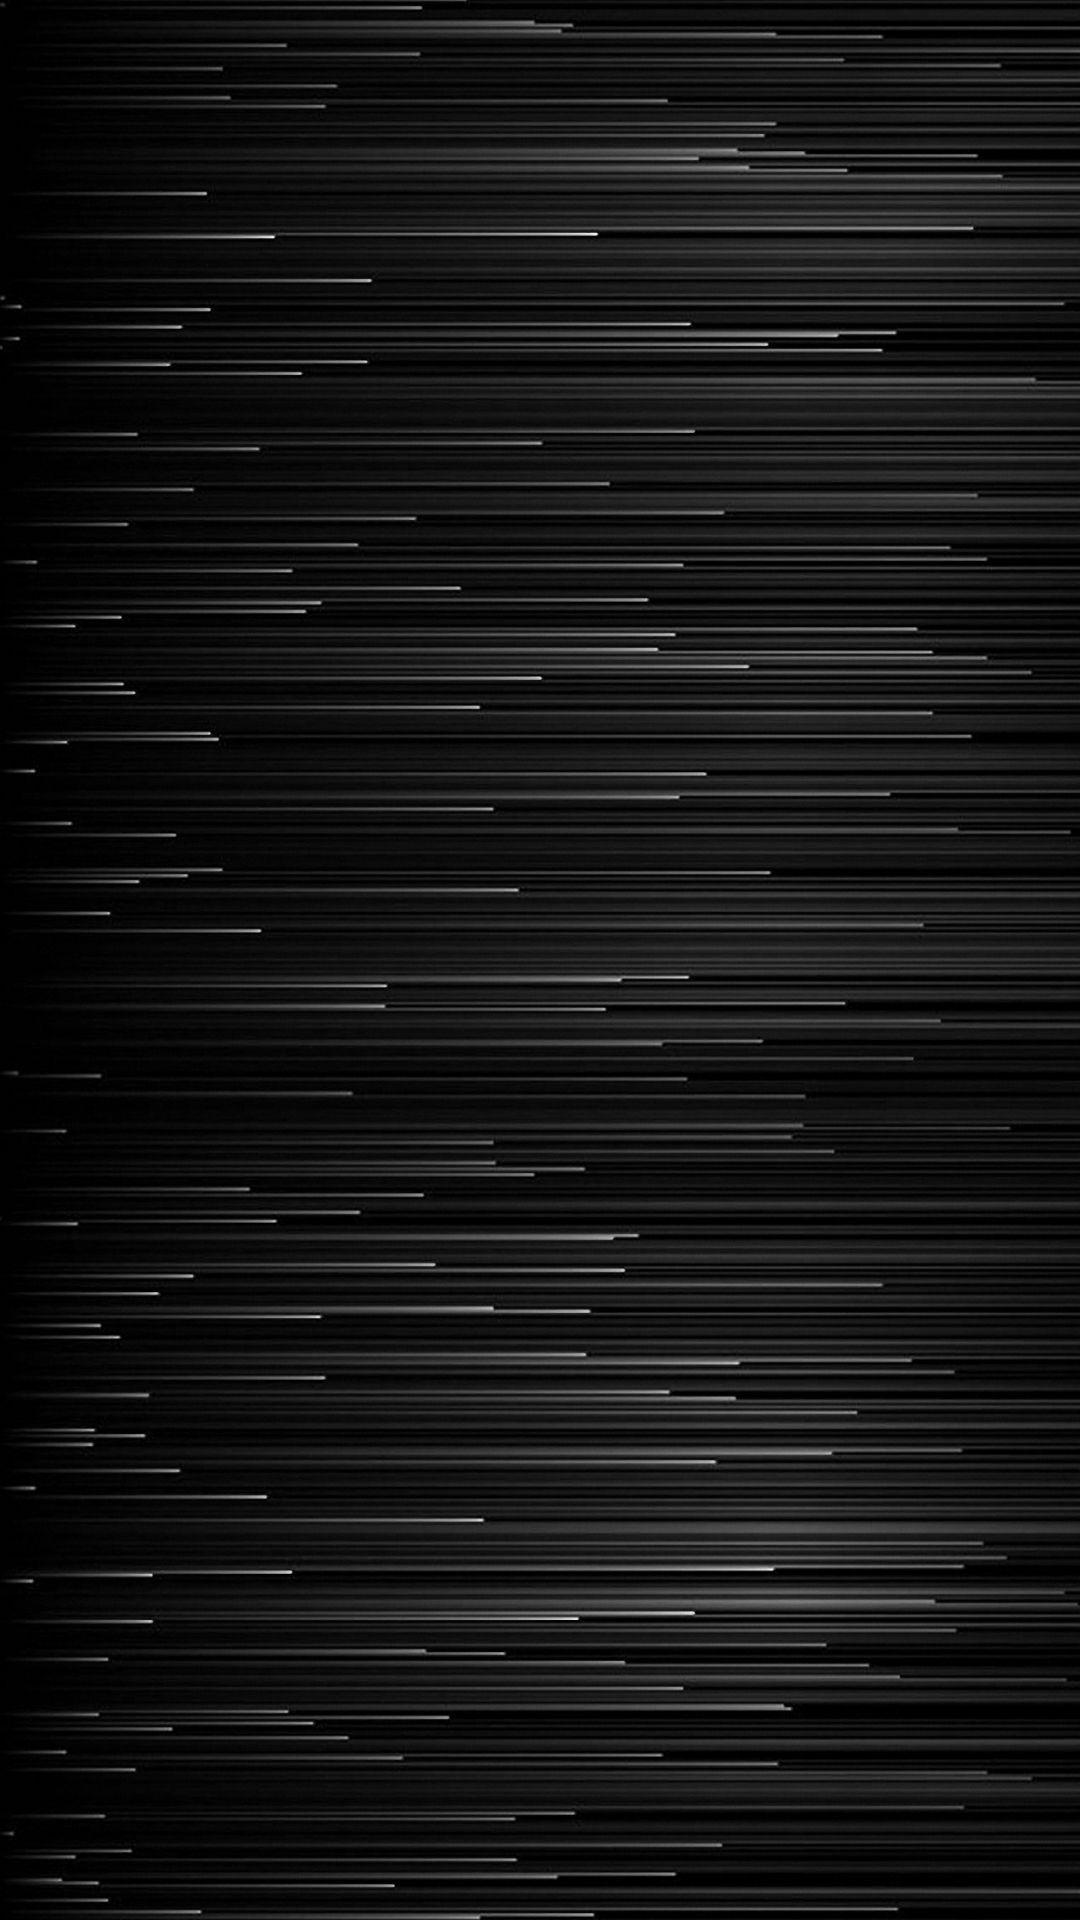 Best 3d Black Iphone Wallpapers 20 Images Wallpaperboat